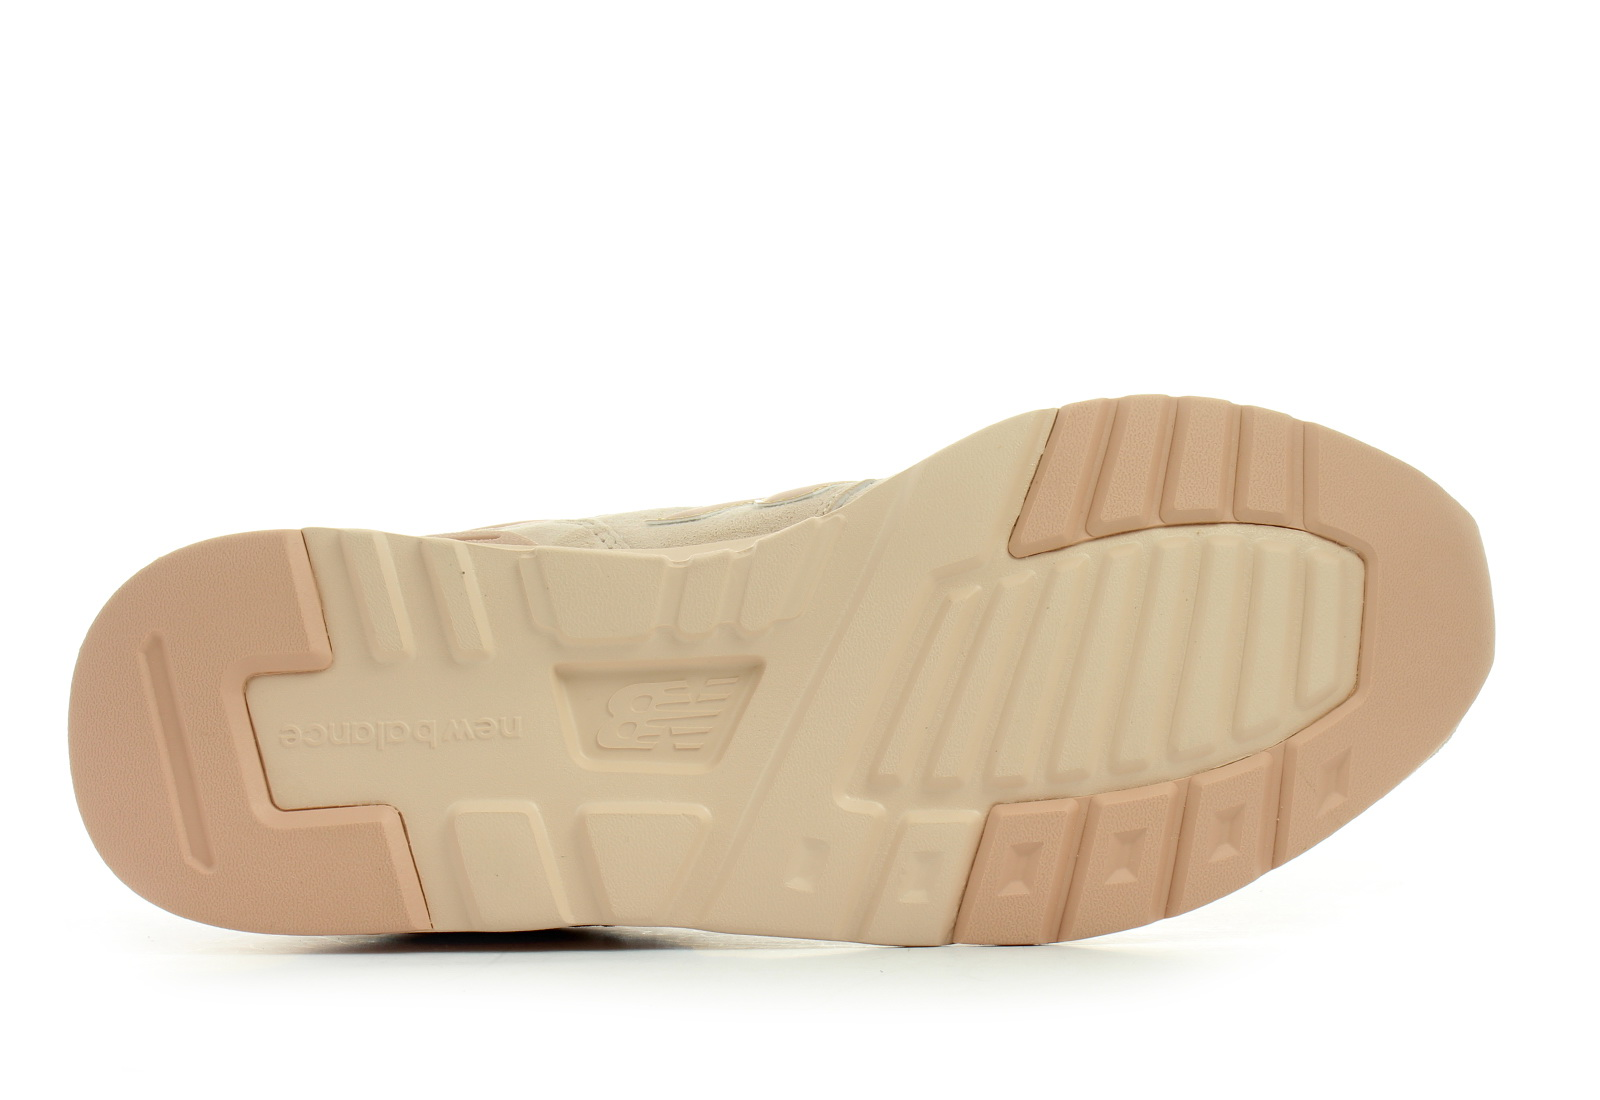 00afc9f638a New Balance Niske Cipele Roze Cipele - Cw997hcd - Office Shoes - Online  trgovina obuće